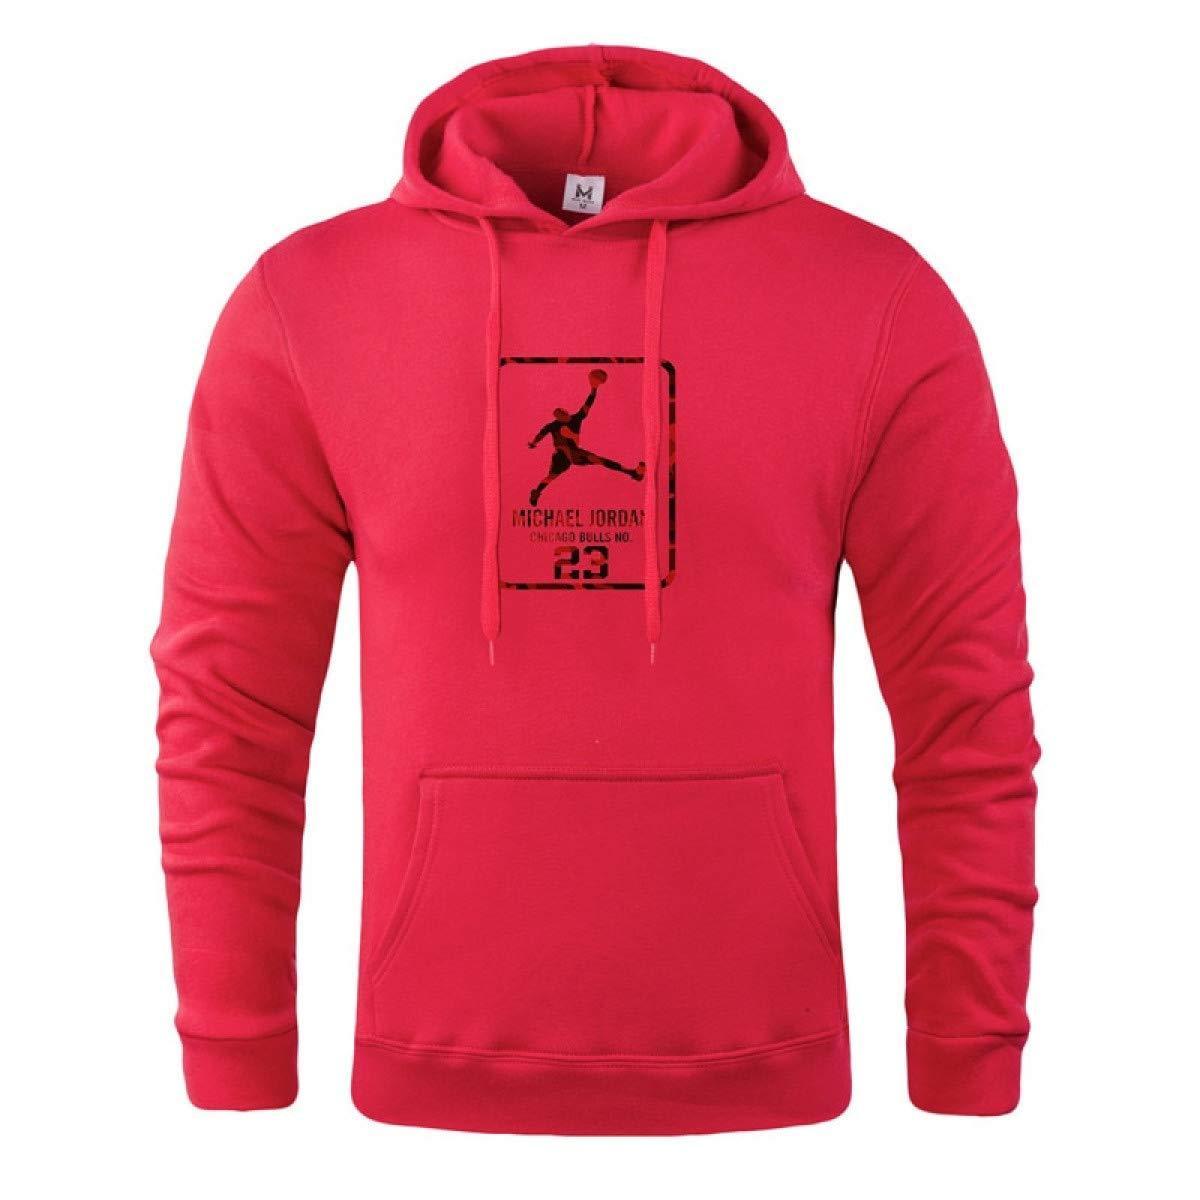 Mens Hoodies Fashion line Casual Cover Head Hoodie Men Hip-hop Sweatshirt